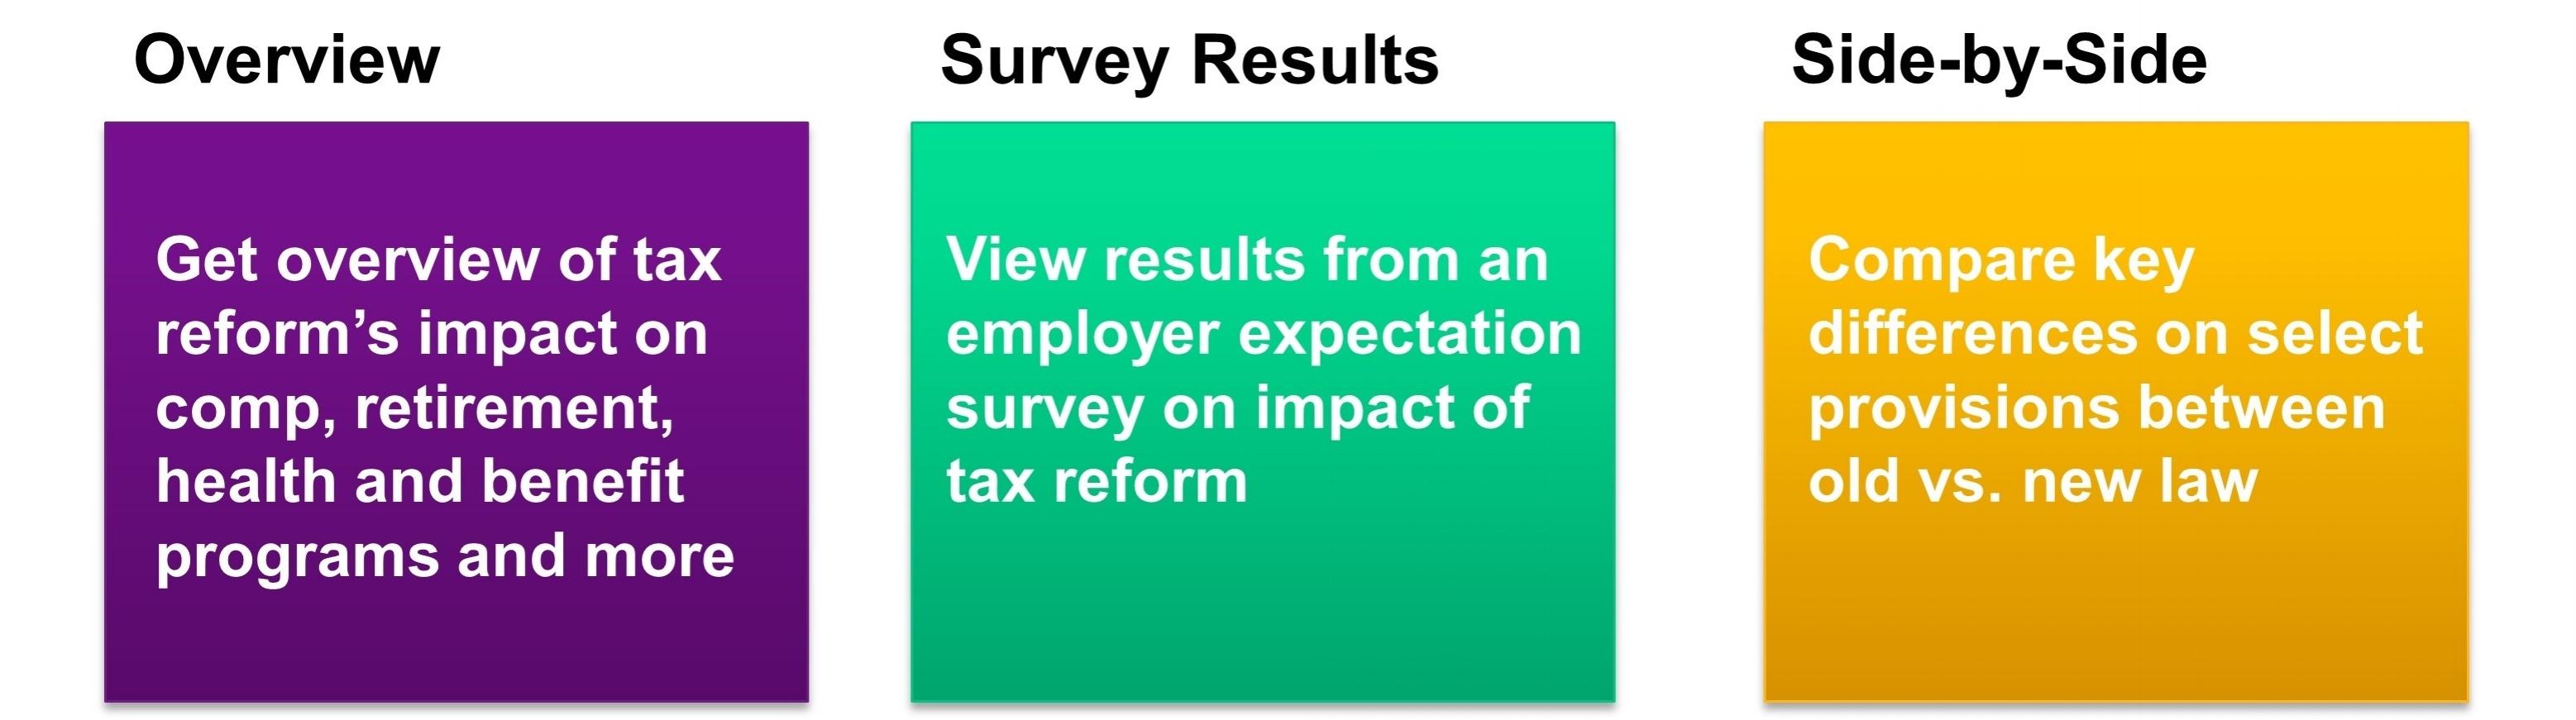 Tax Reform LP Image 3-093244-edited.jpg